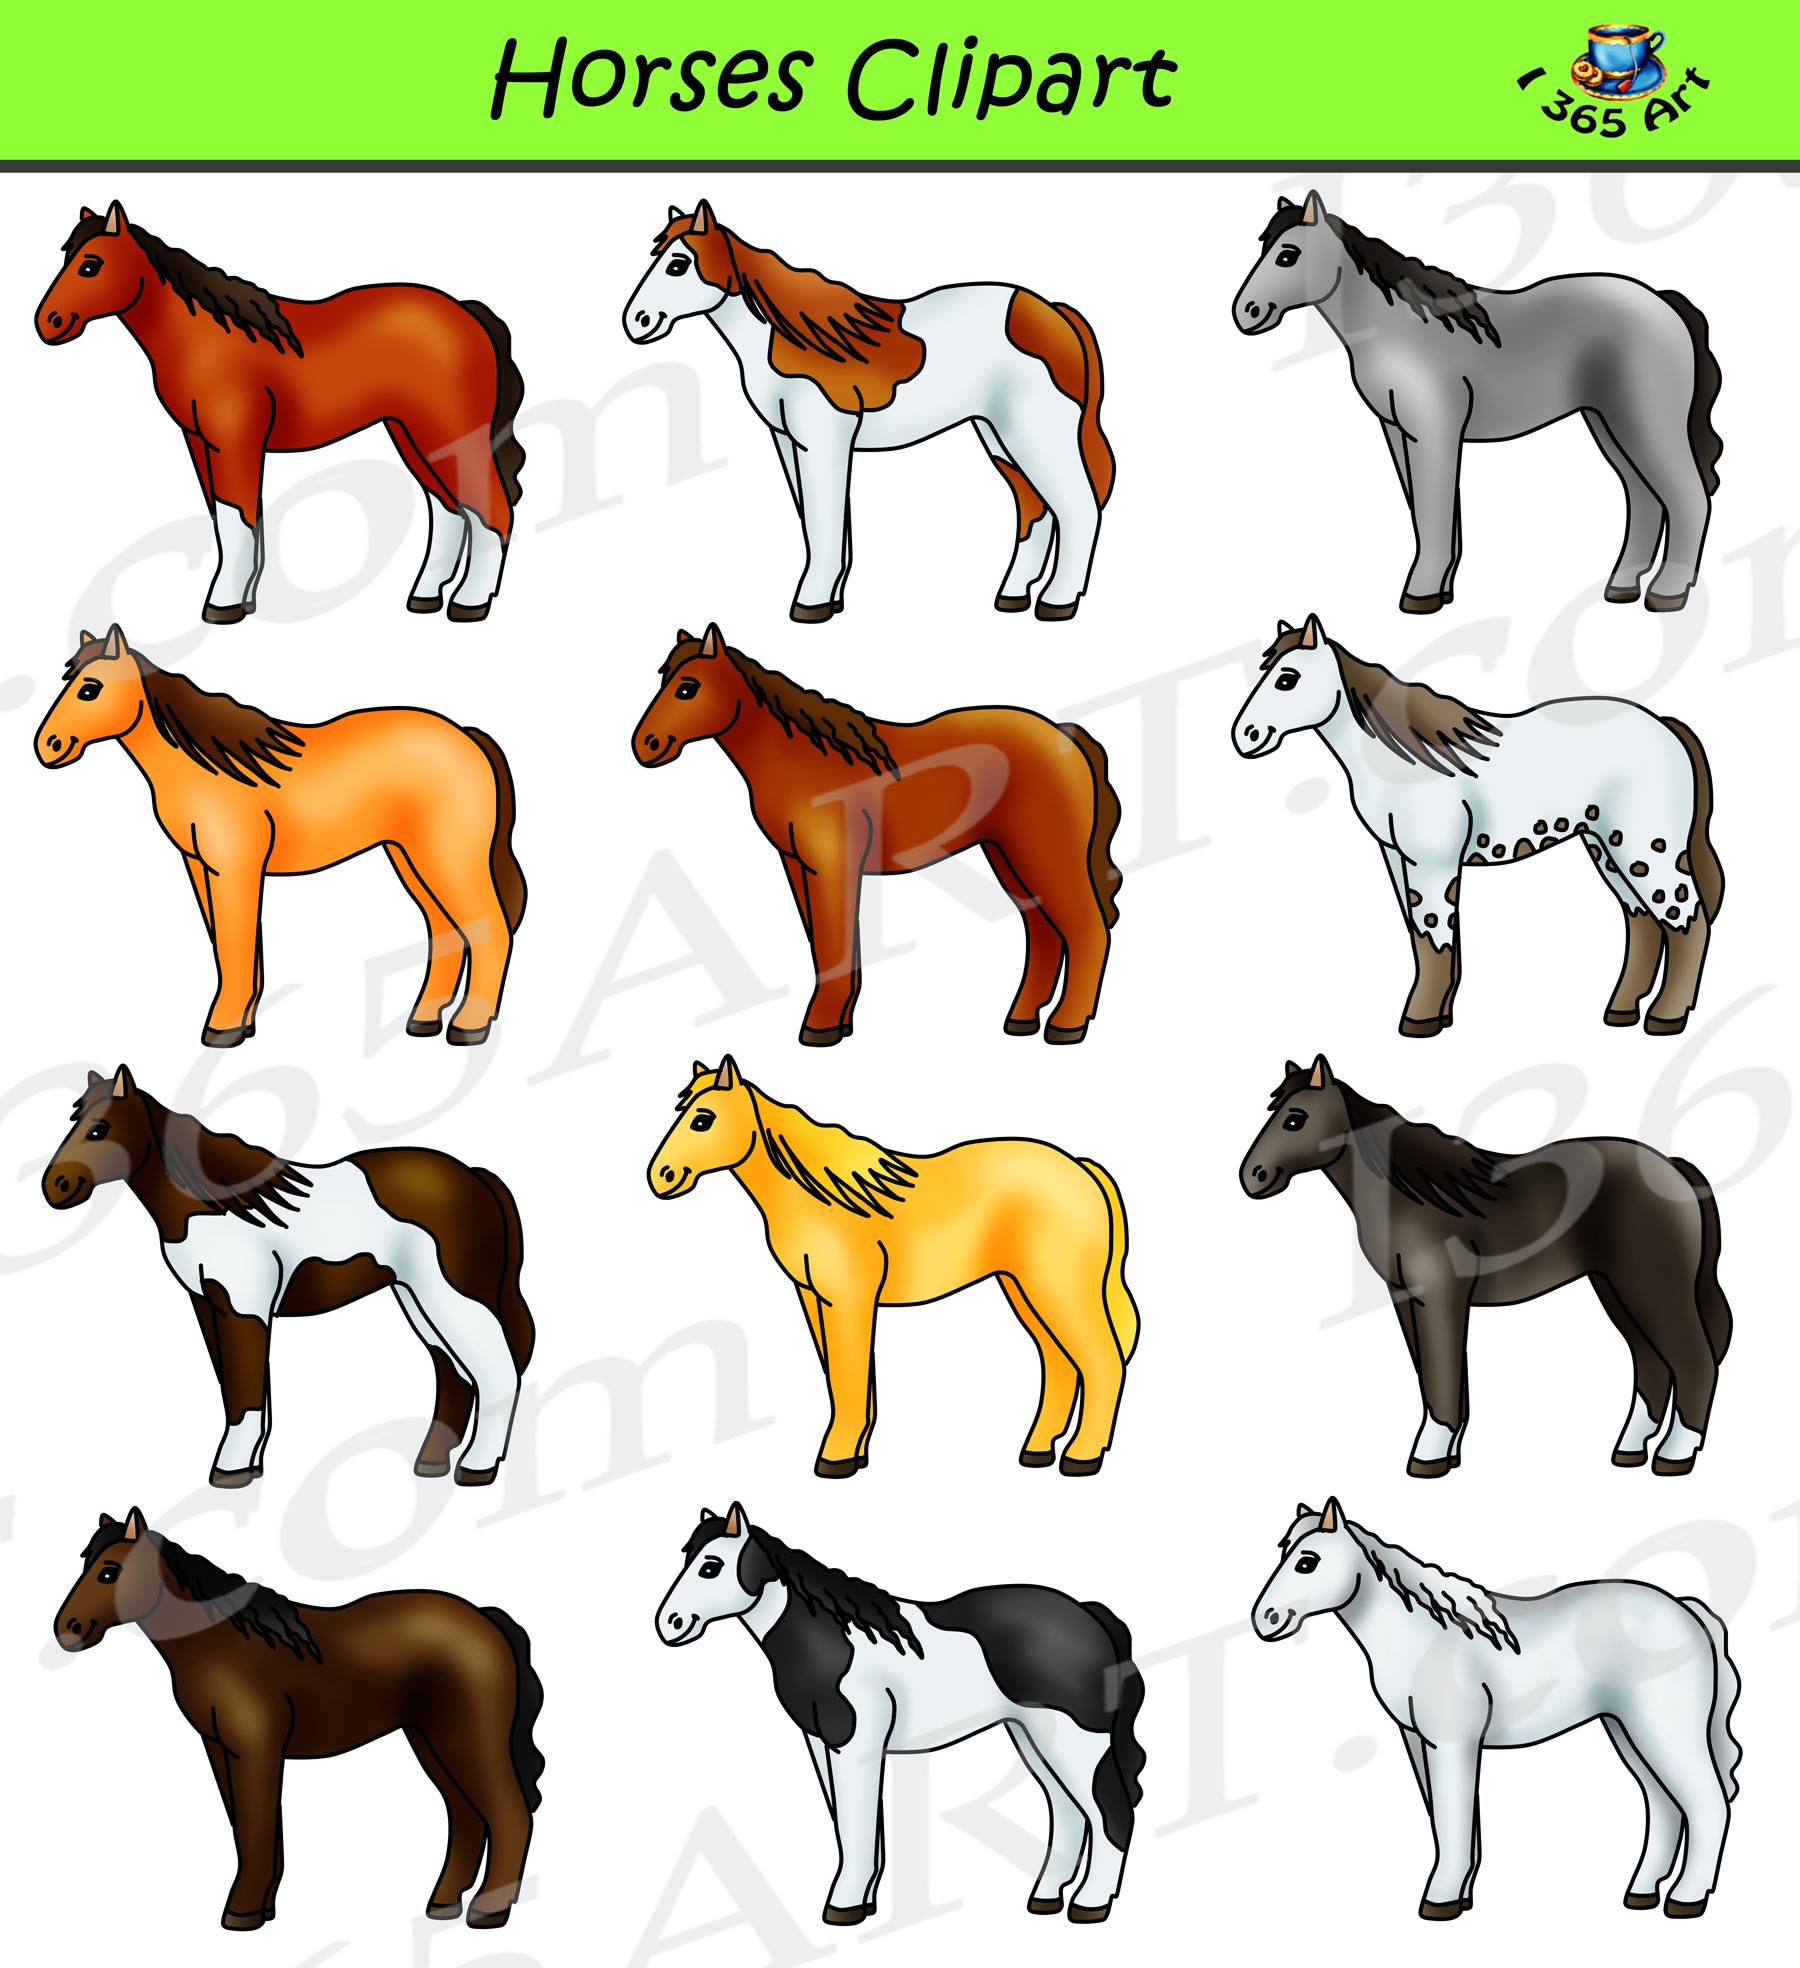 clipart transparent stock Horses clipart. Horse pony graphics download